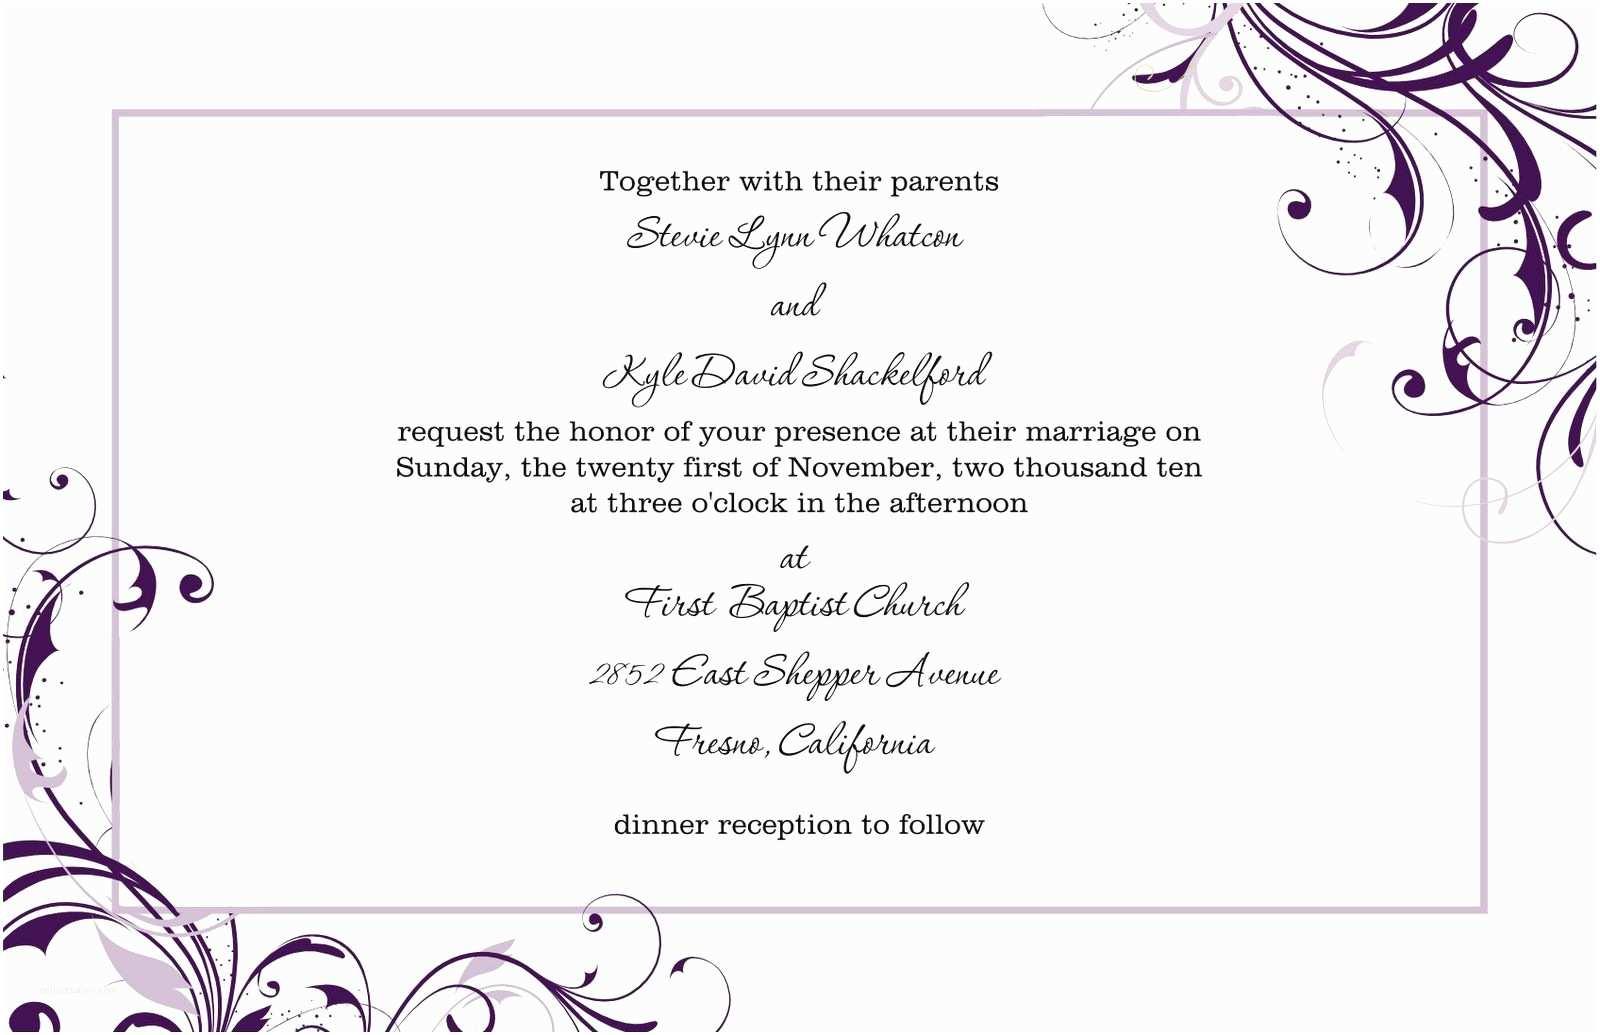 Wedding Invitation software Free Blank Wedding Invitation Templates for Microsoft Word